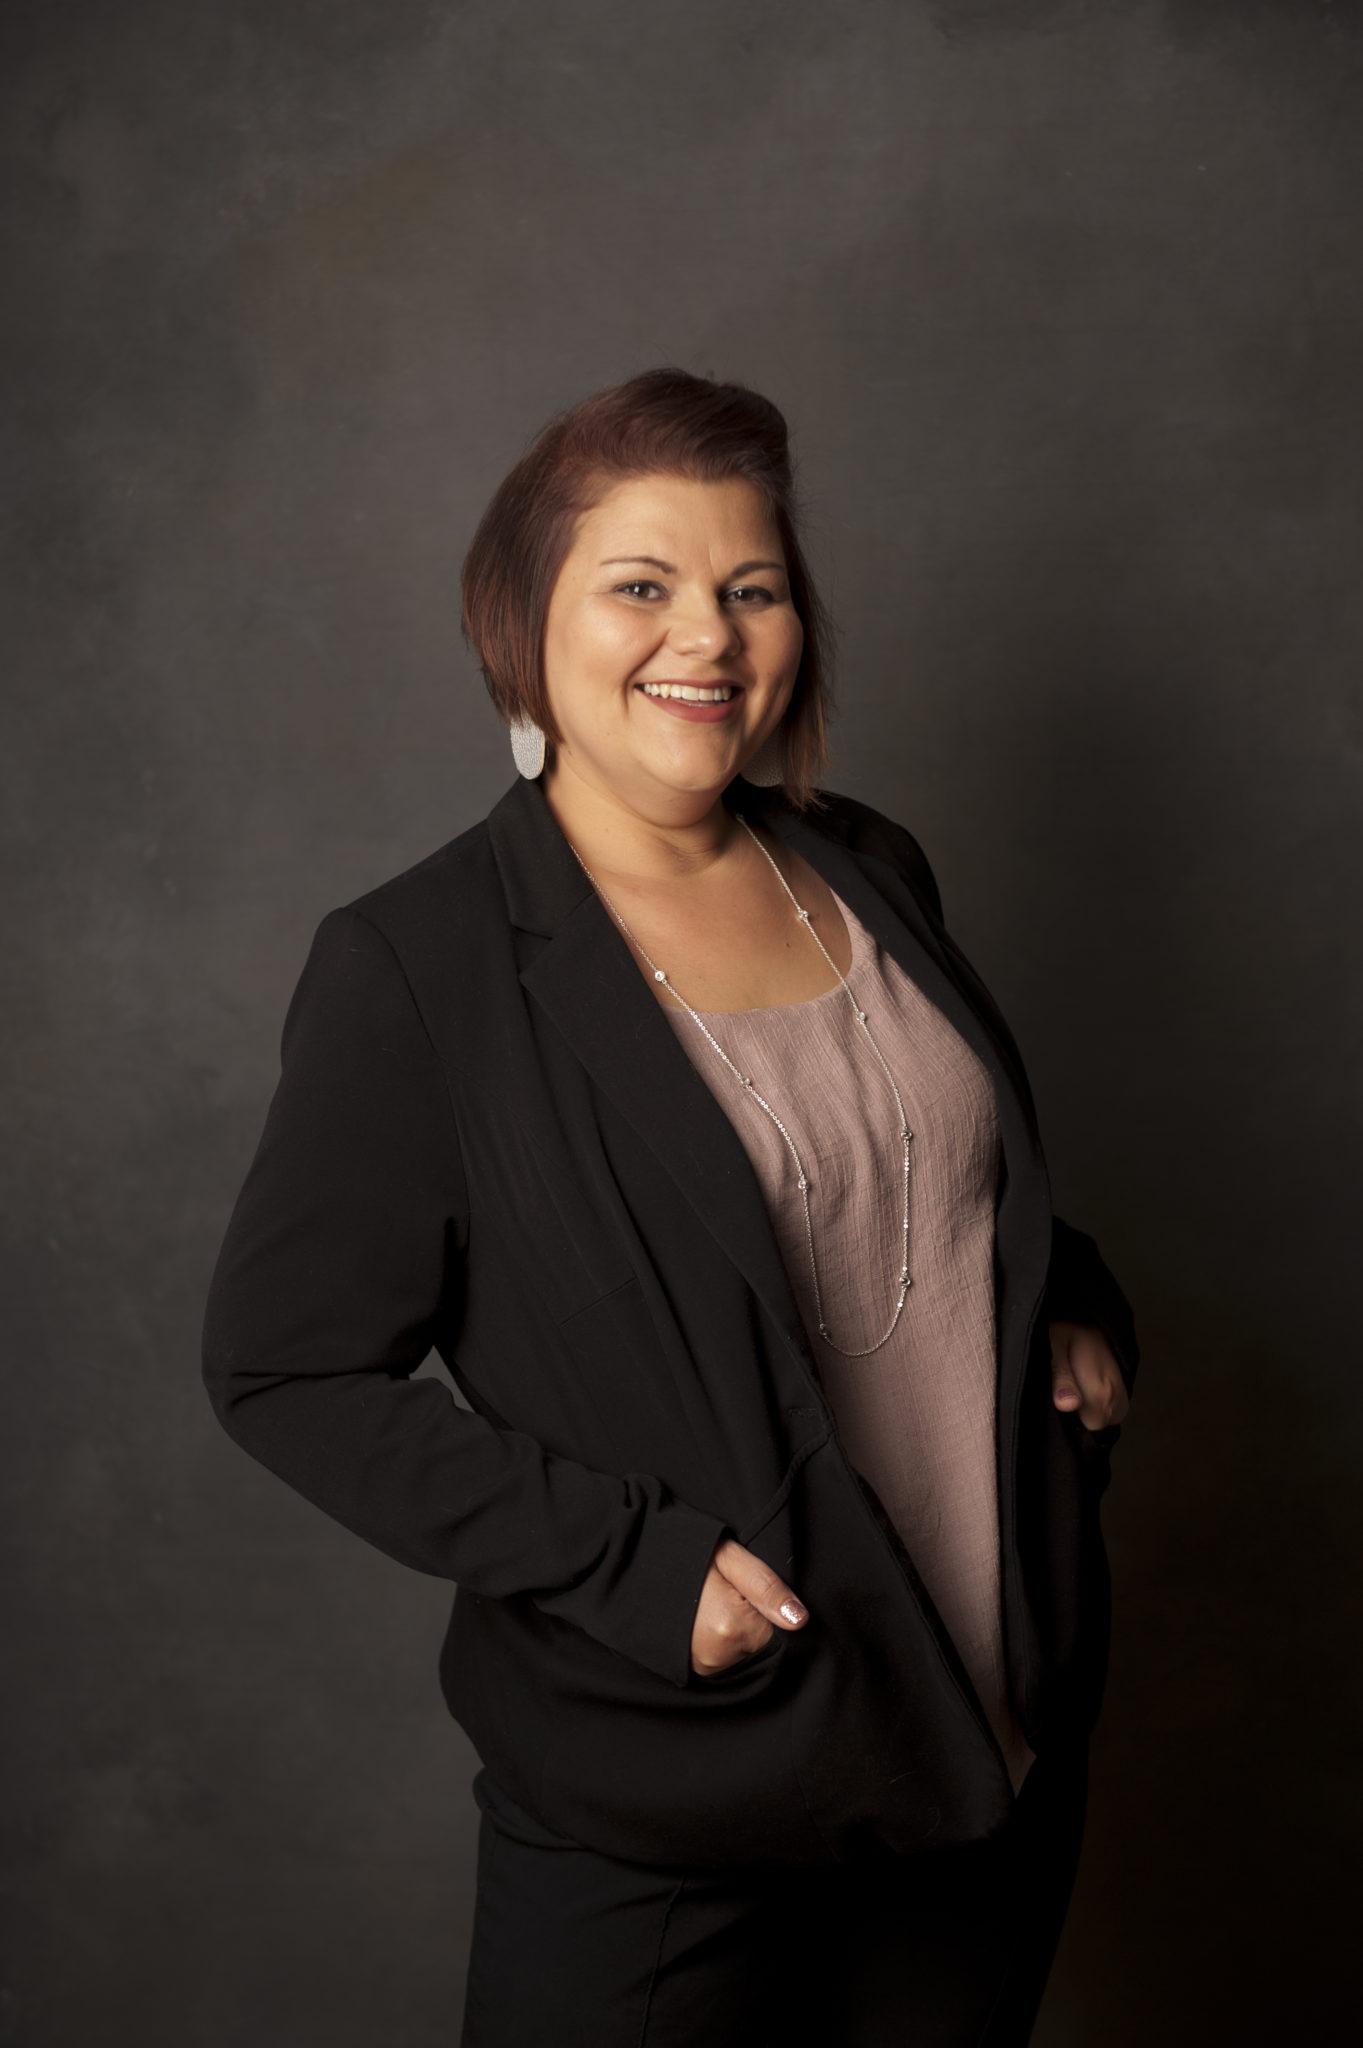 Christina Mosser